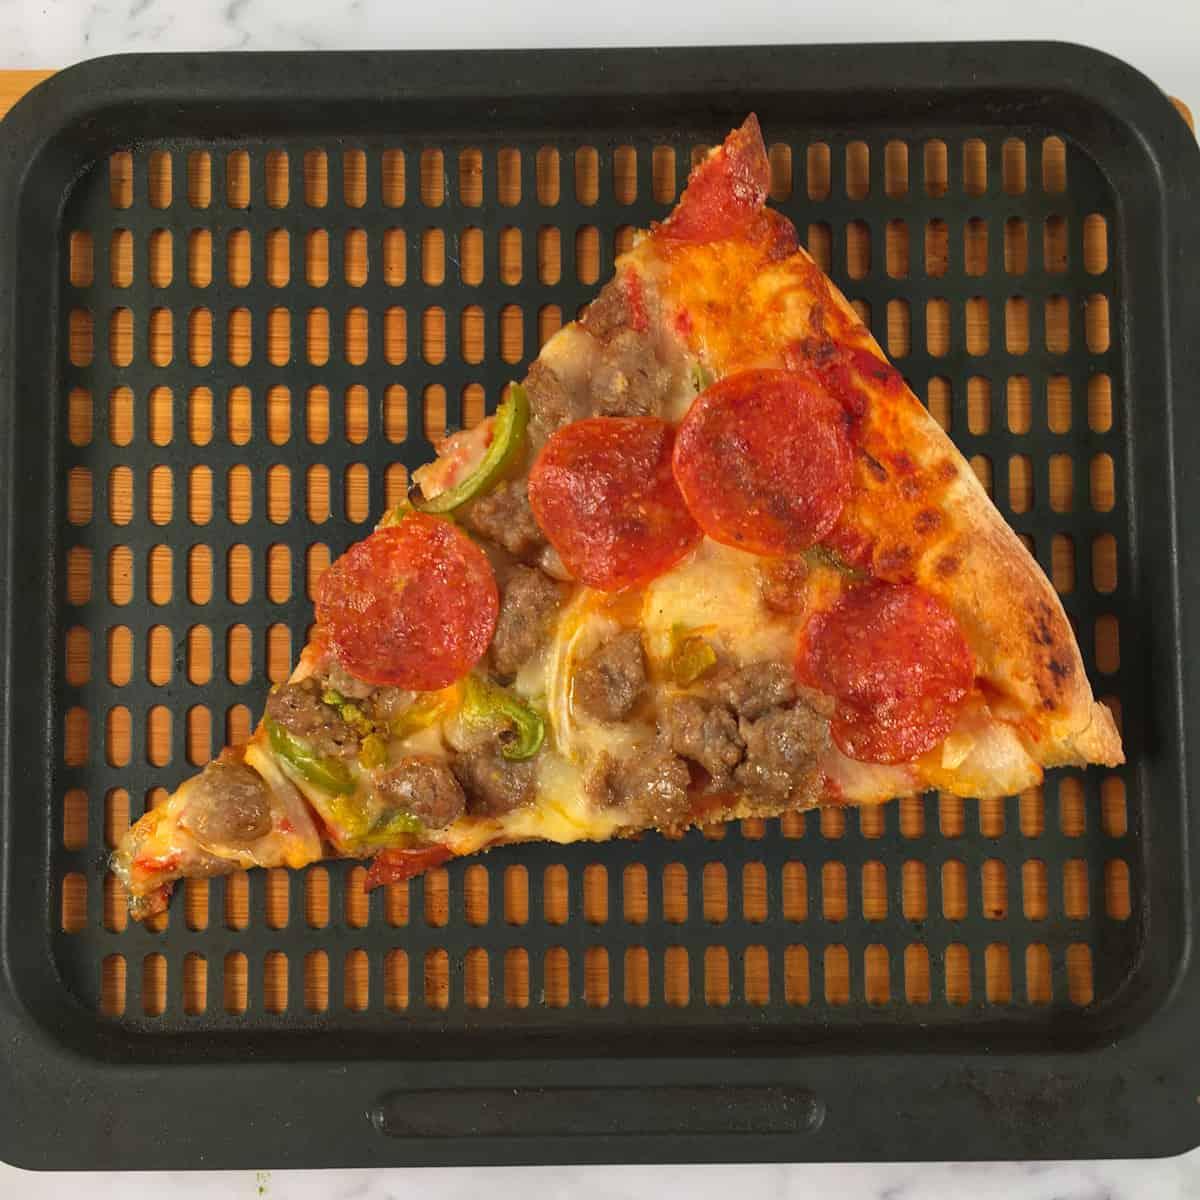 air fryer reheat pizza